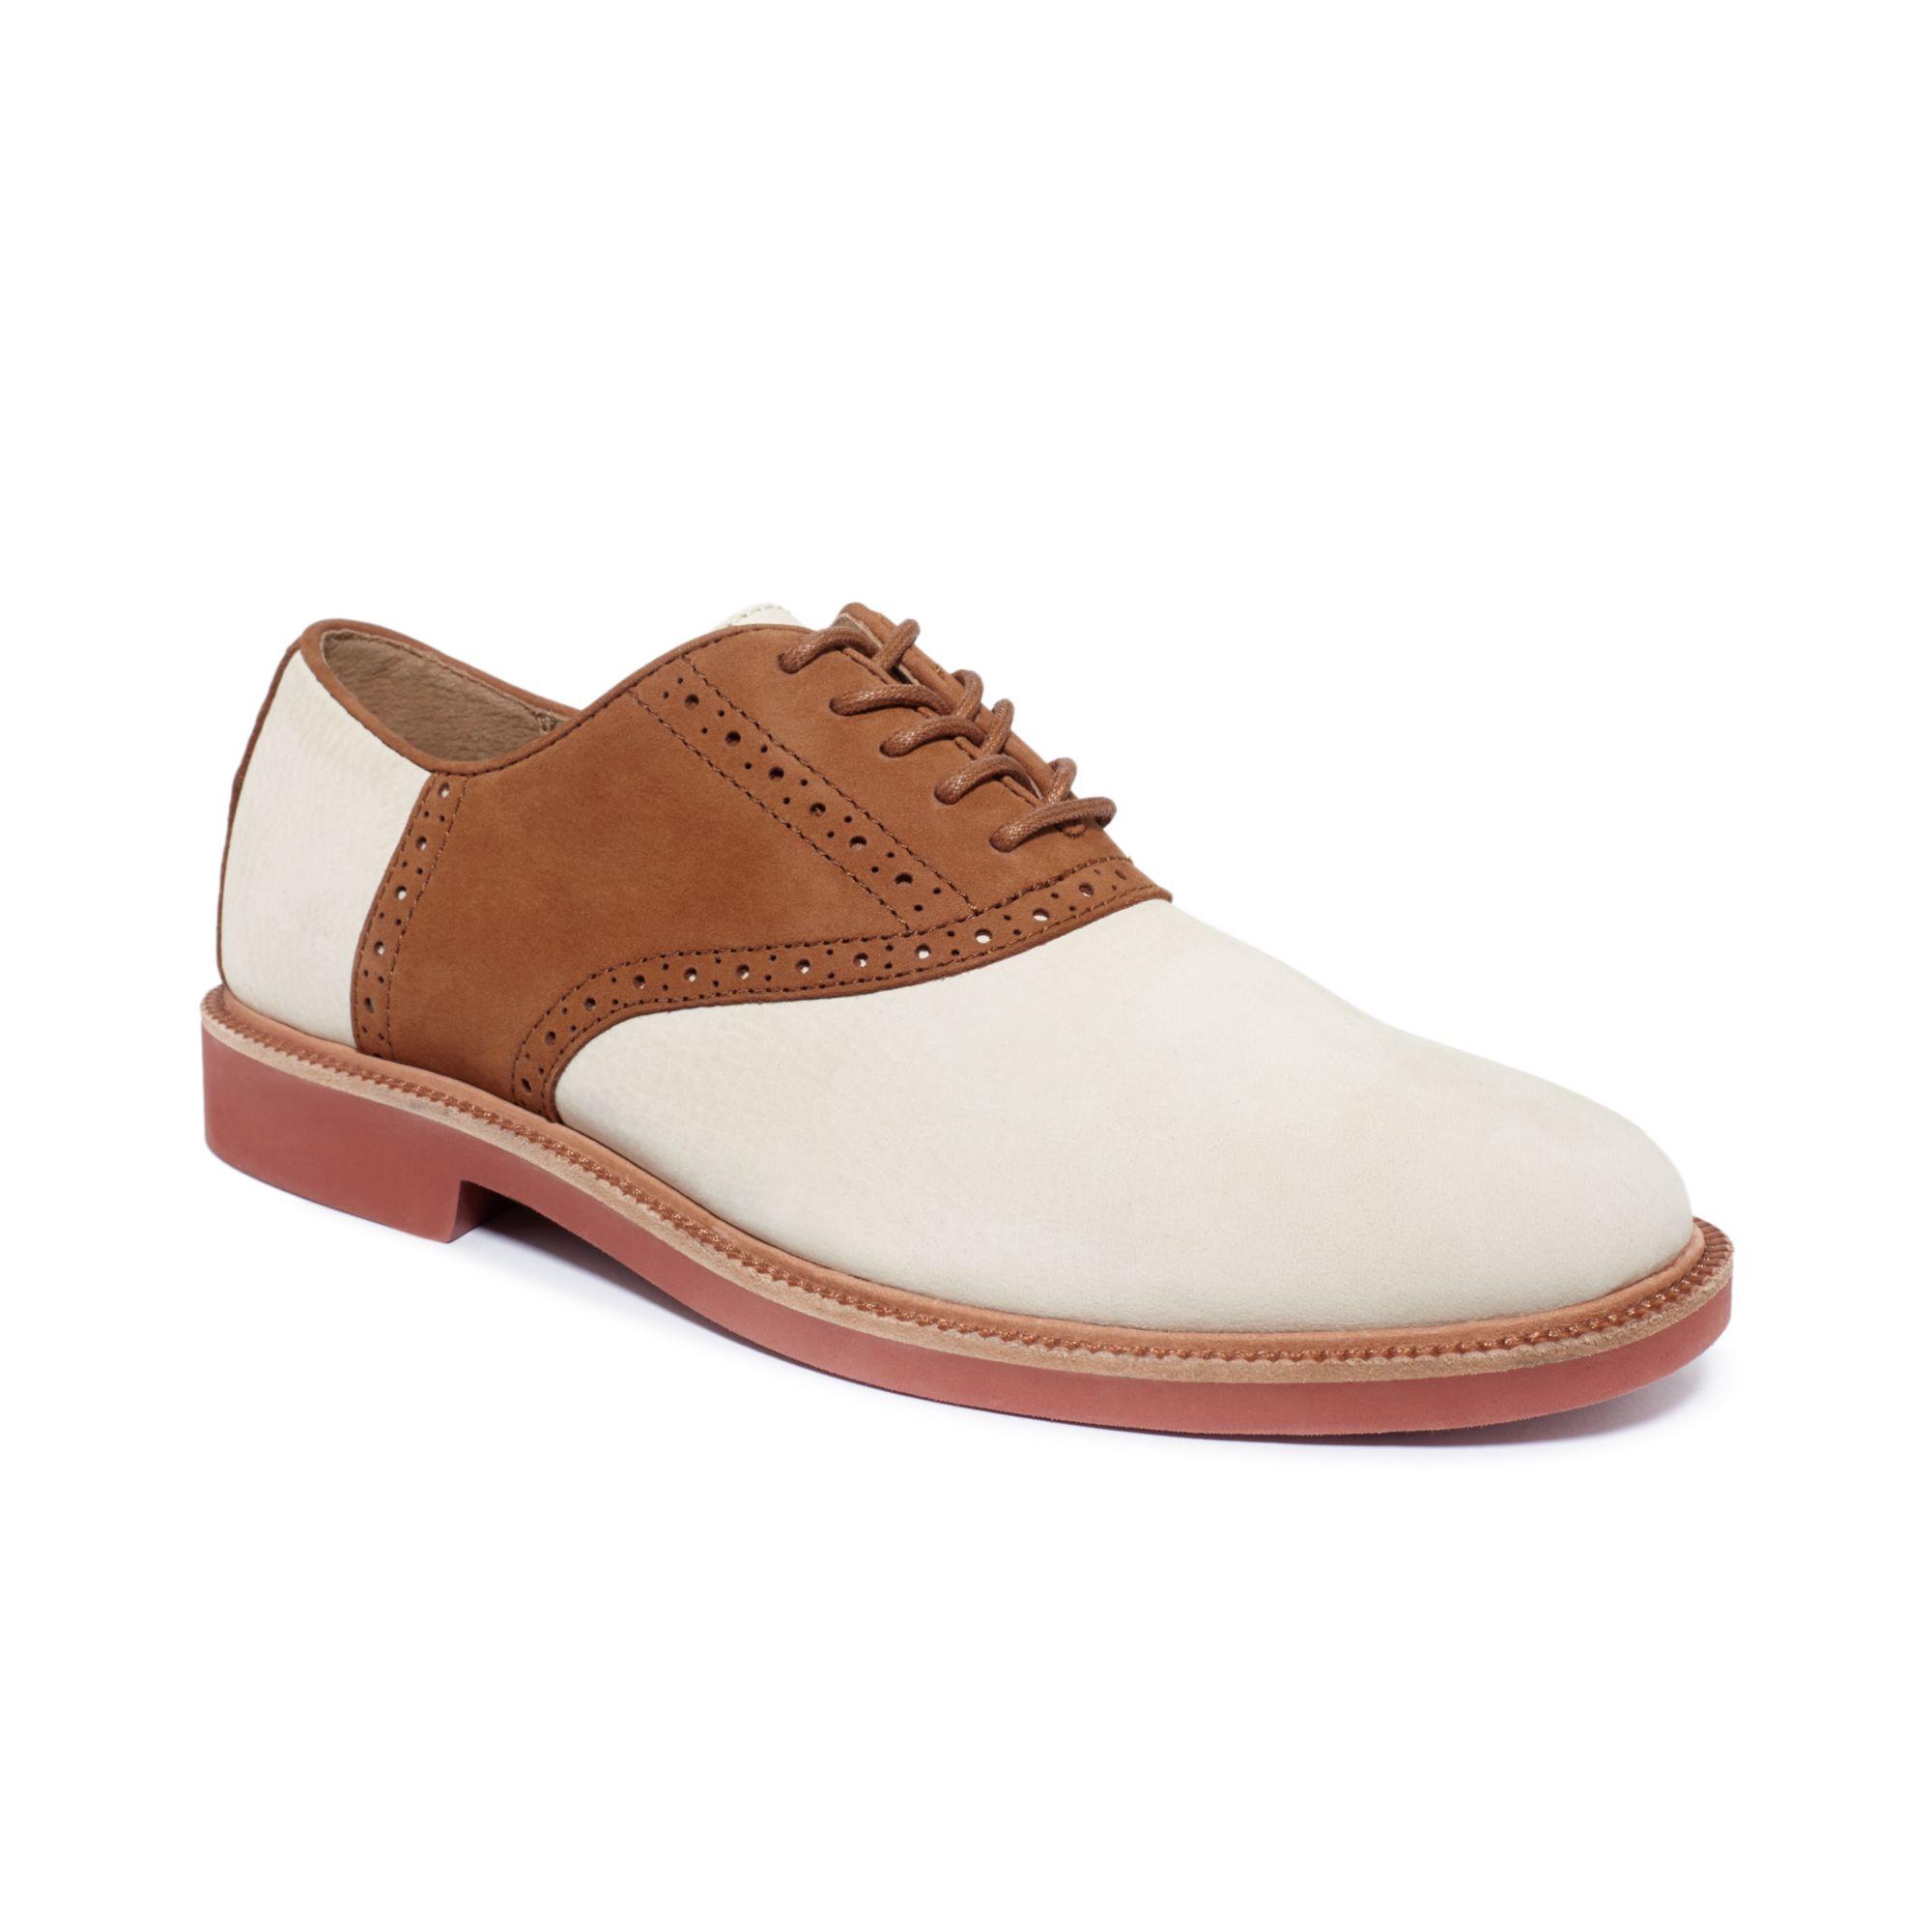 Johnston Dress Shoes